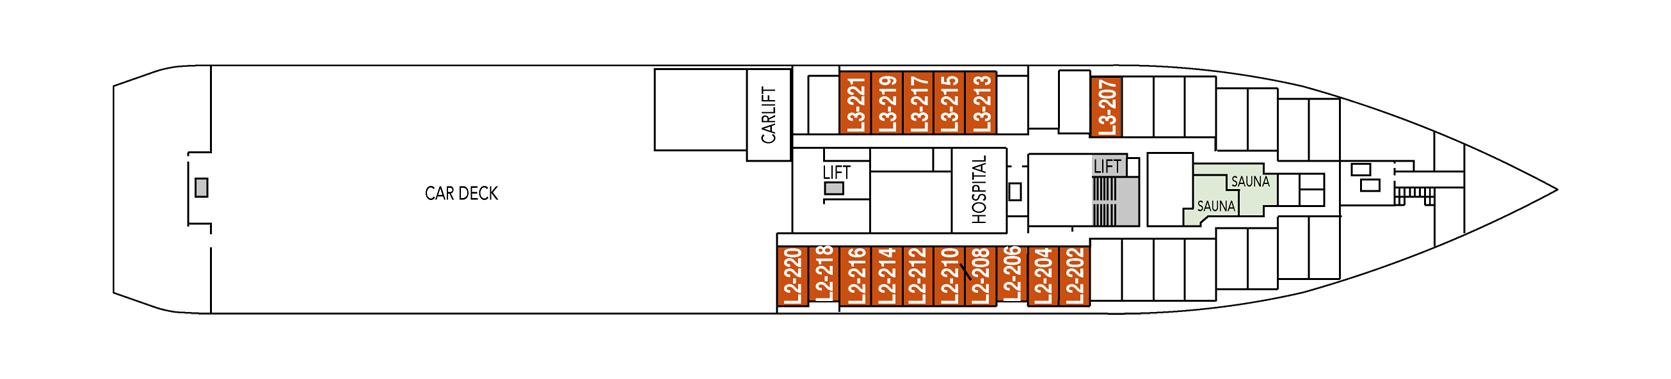 Deck 2.png